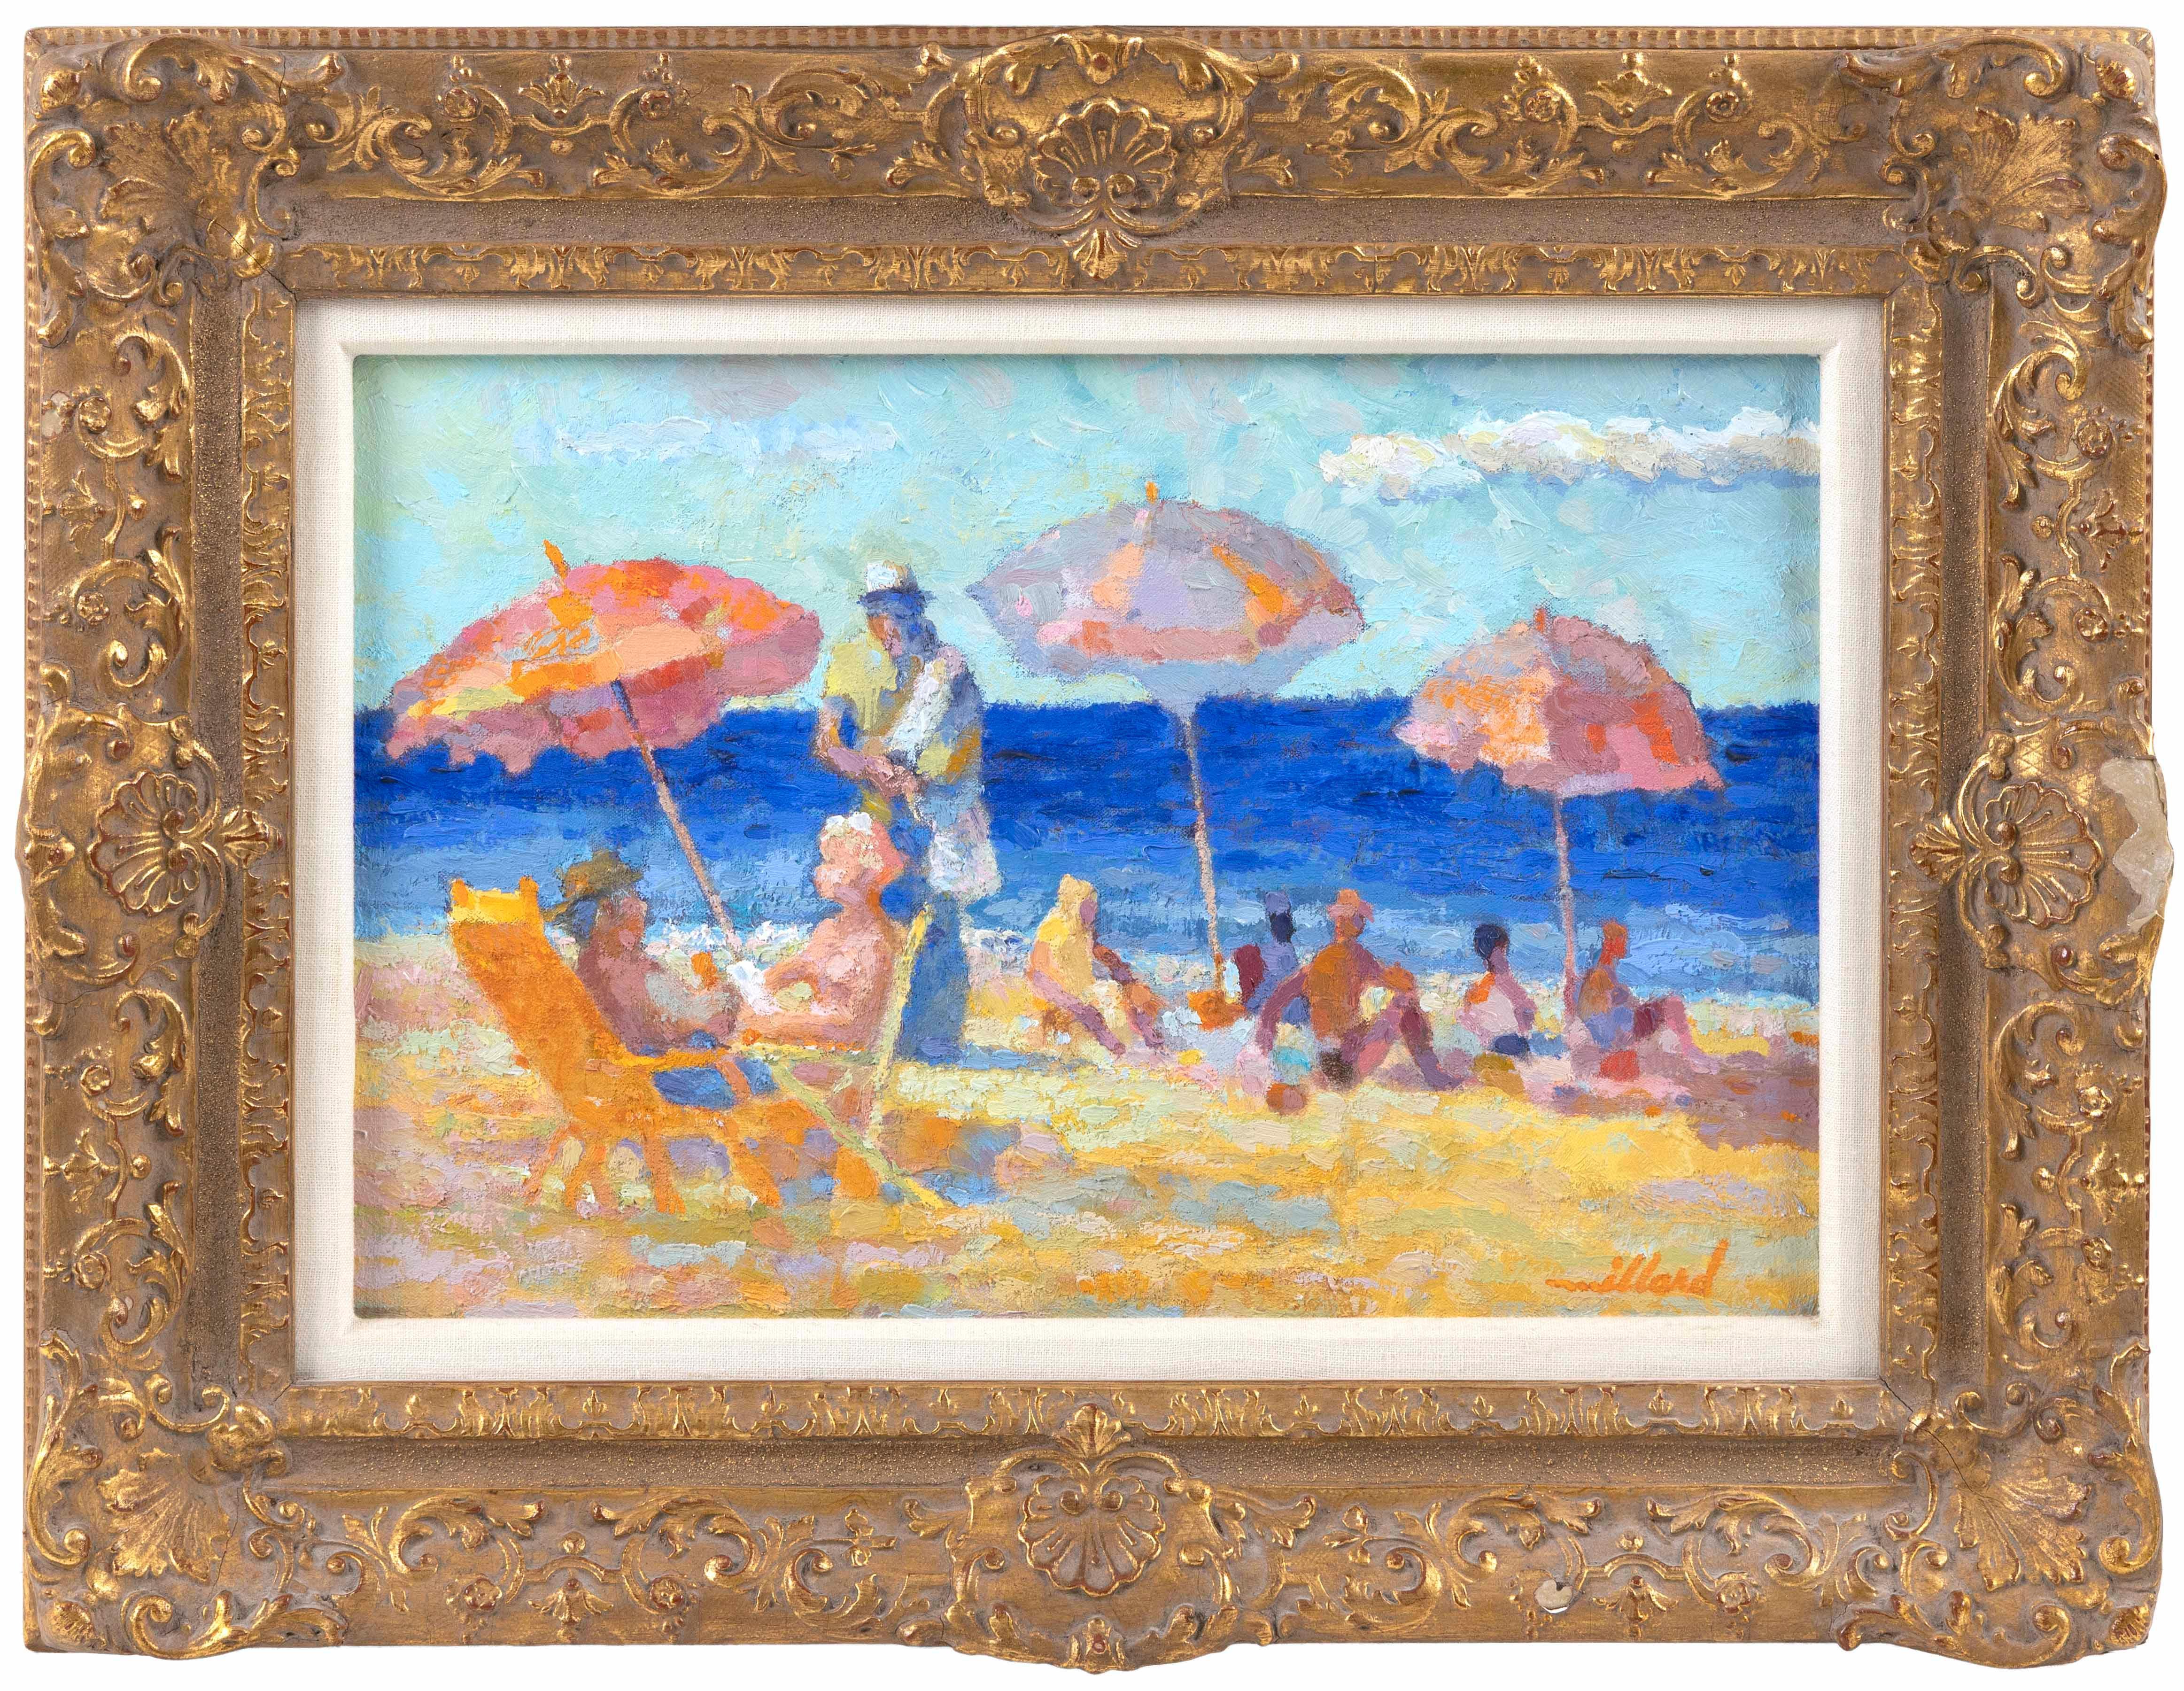 "DAVID L. MILLARD, Massachusetts, 1915-2002, ""Le Belle Plage, Cannes, Fr.""., Oil on canvas, 12"" x 18"". Framed 19"" x 26""."